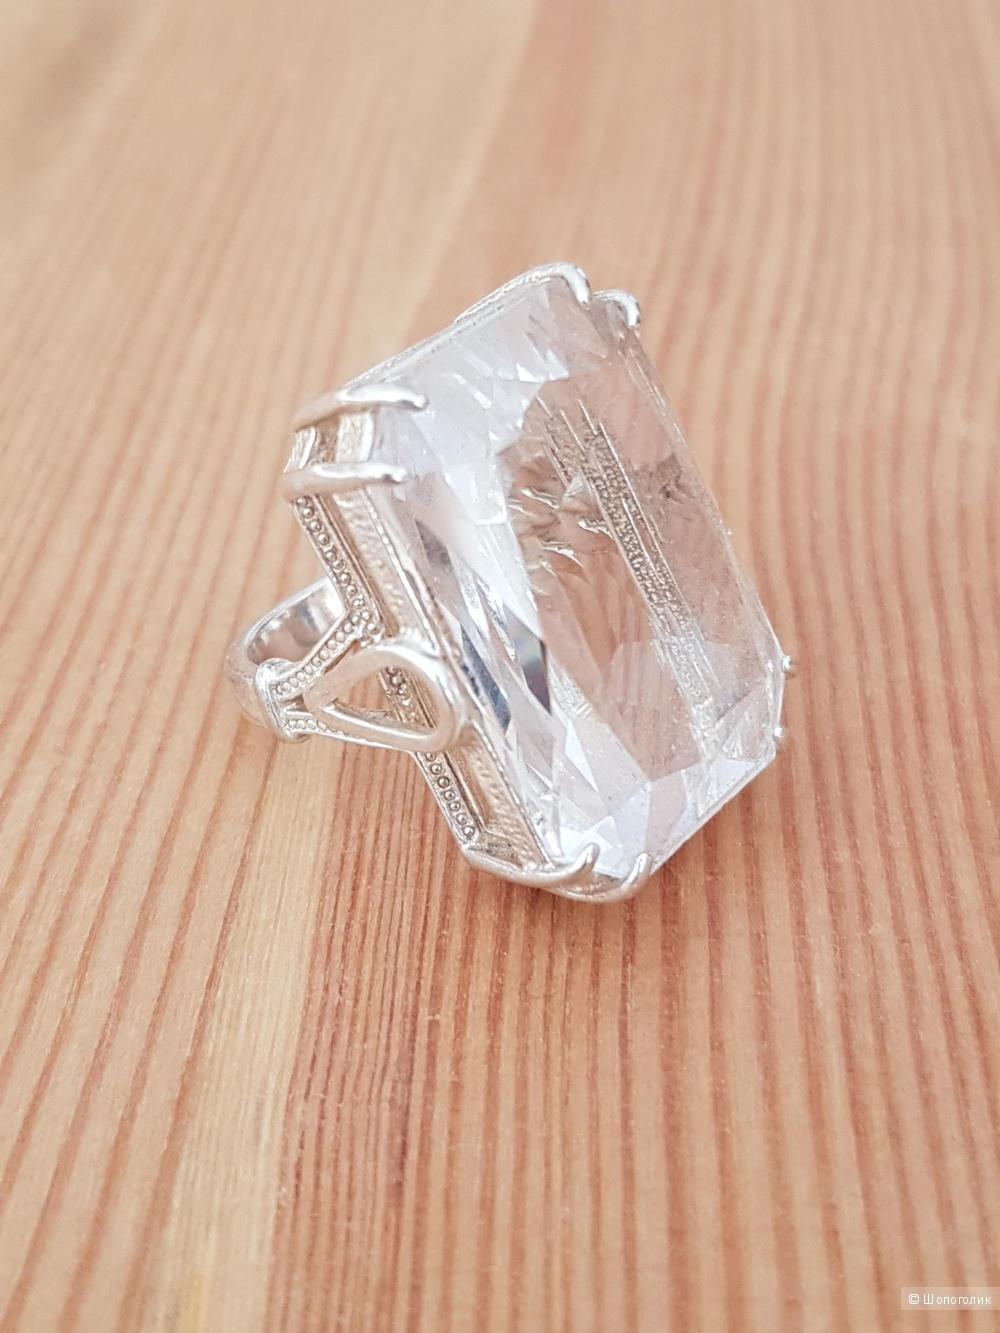 Кольцо ICE, размер 17,5